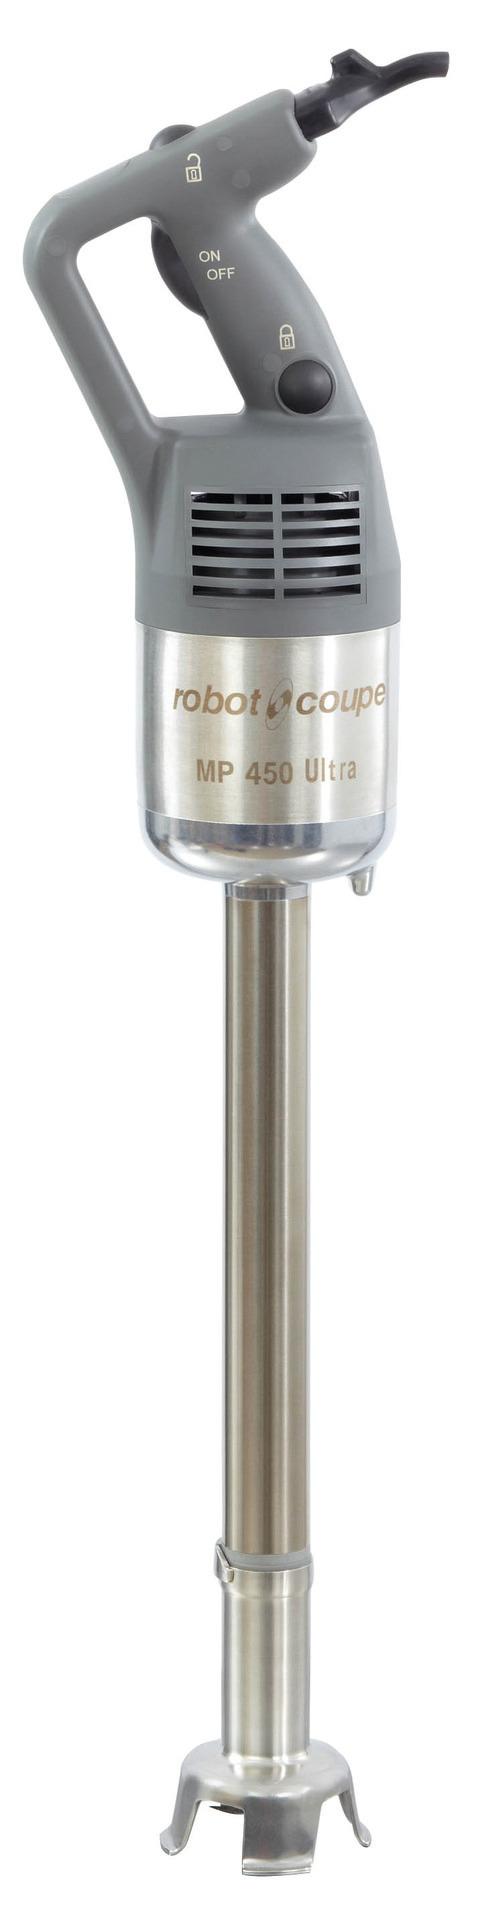 Stabmixer MP 450 mm Ultra / 230 V / 0,50 kW